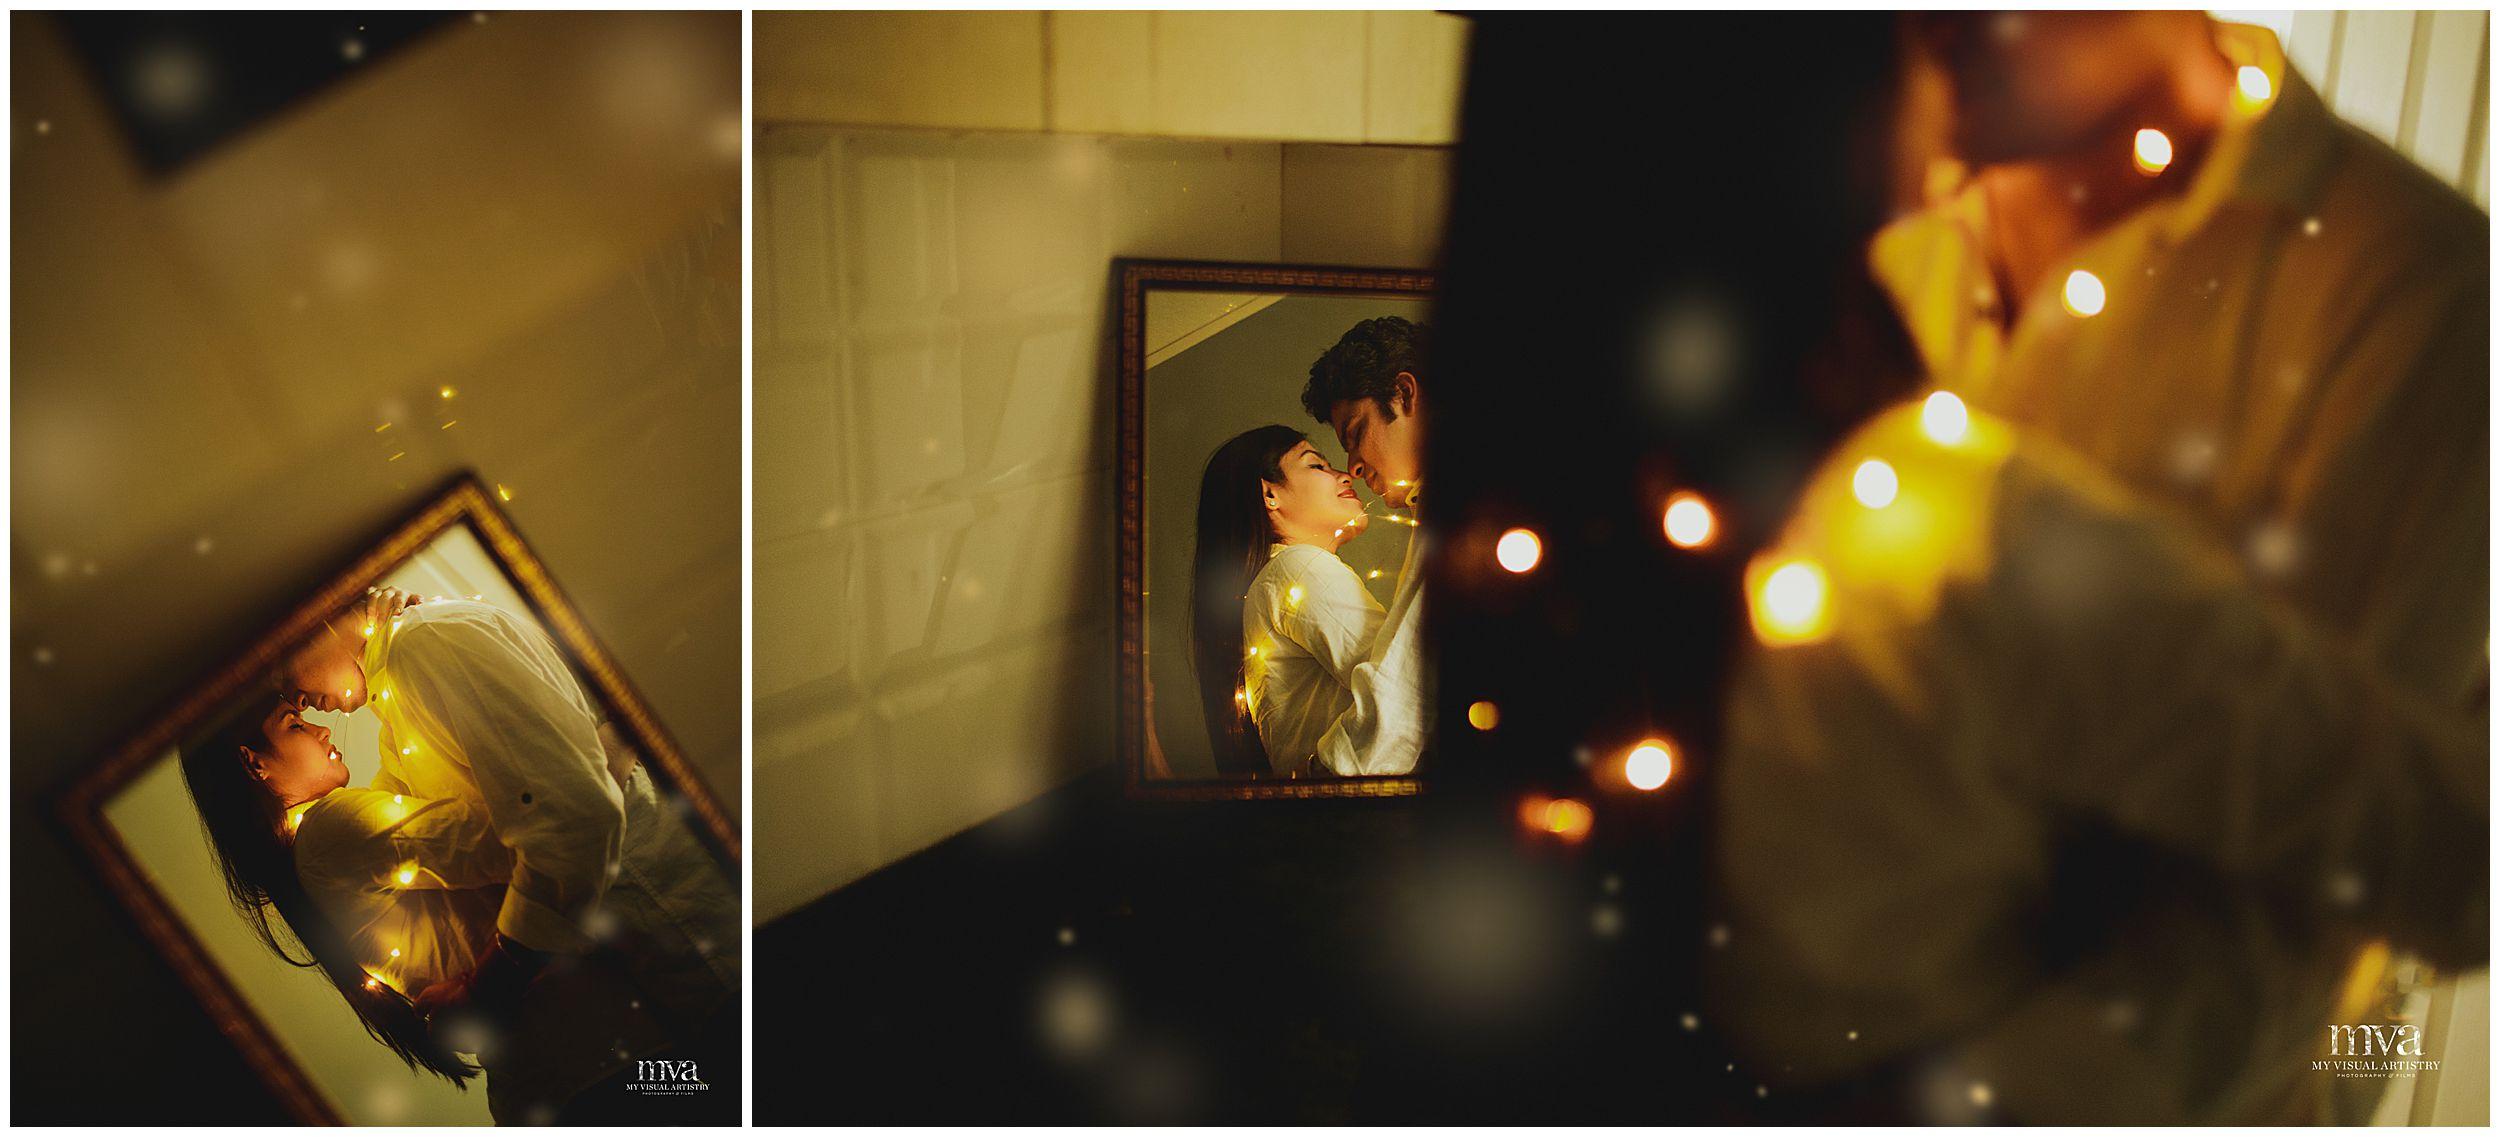 SAHIL_MANALI_MYVISUALARTISTRY__WEDDING_PHOTOGRAPHER_JANNATVALLEY_COUPLESHOOT_DESTINATION_FARIDABAD_PREWEDDING25.jpg